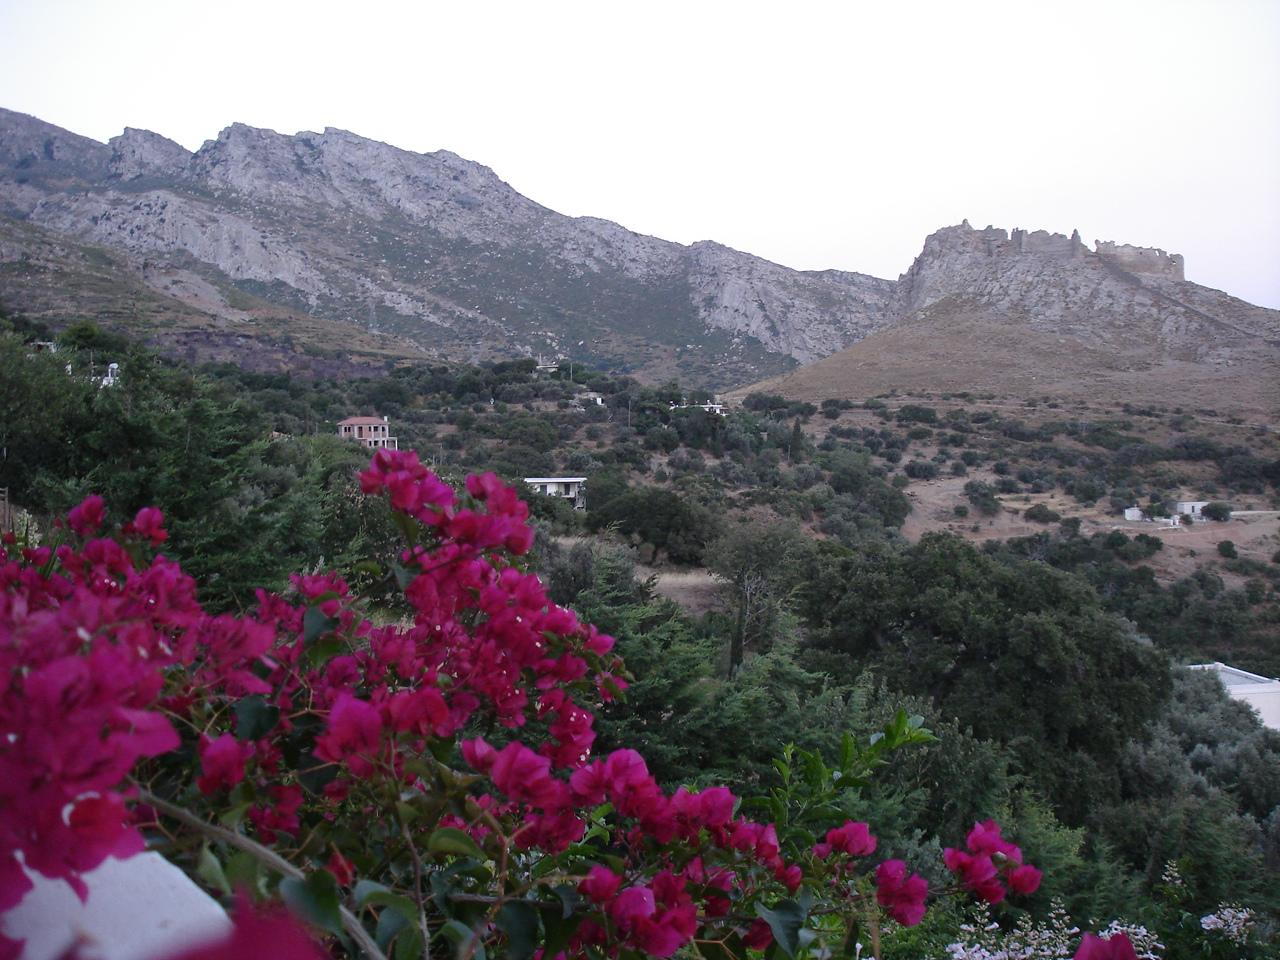 The village of Mekounida